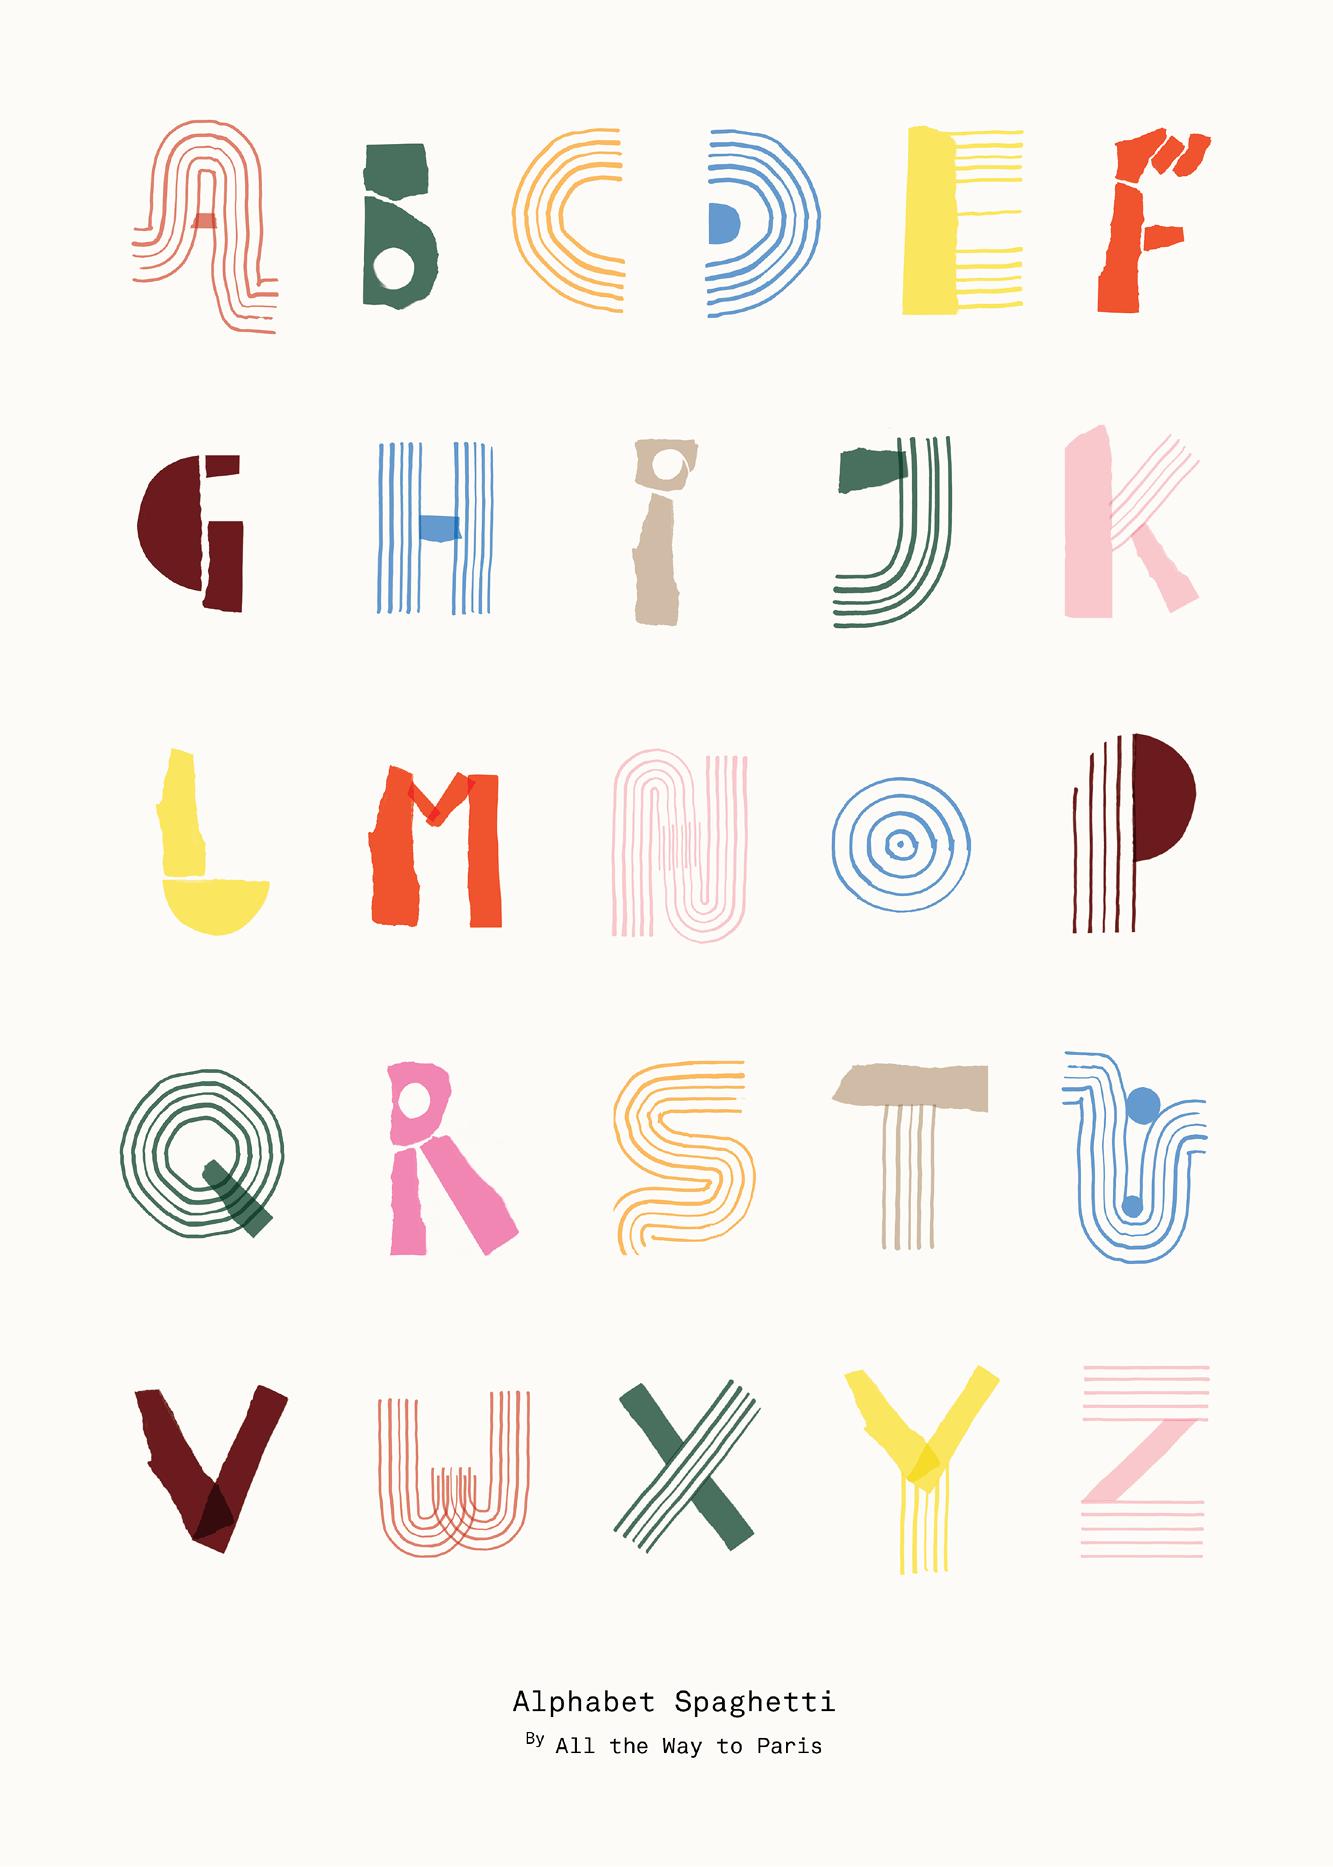 Alphabet Spaghetti colourful (English) in 2020 Apfel